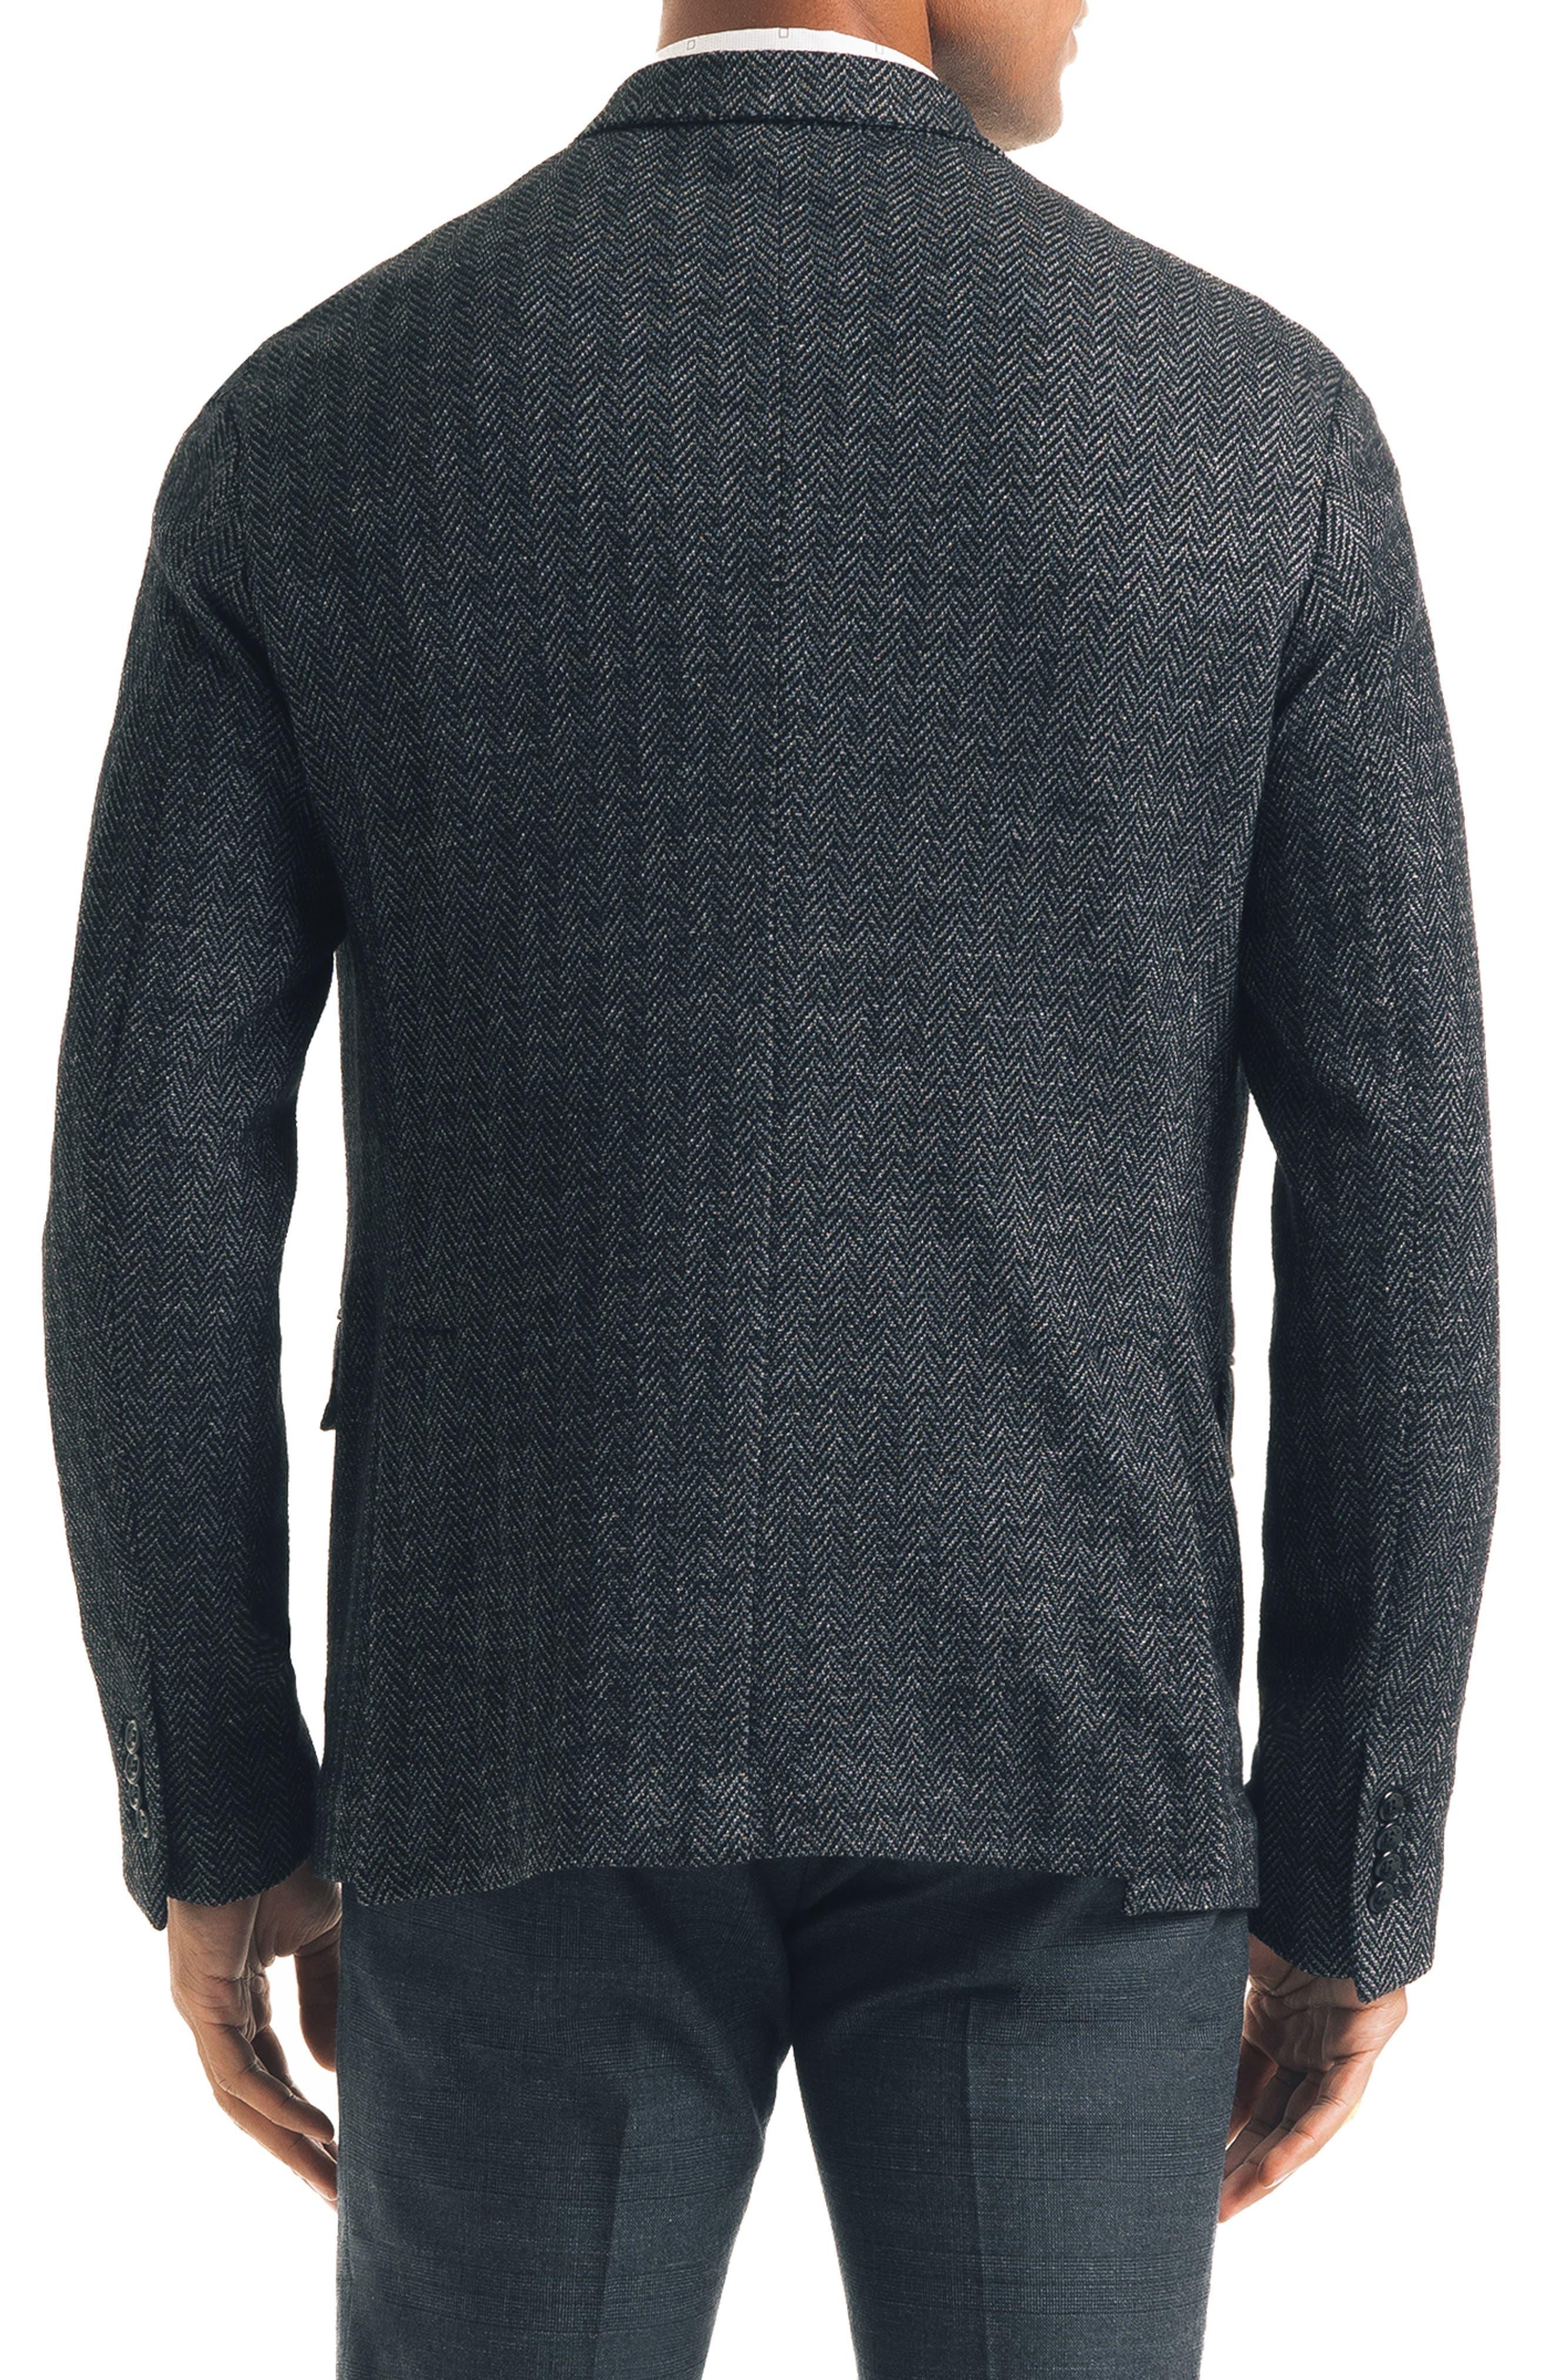 Uptown Trim Fit Herringbone Cotton Blend Sport Coat,                             Alternate thumbnail 2, color,                             BLACK